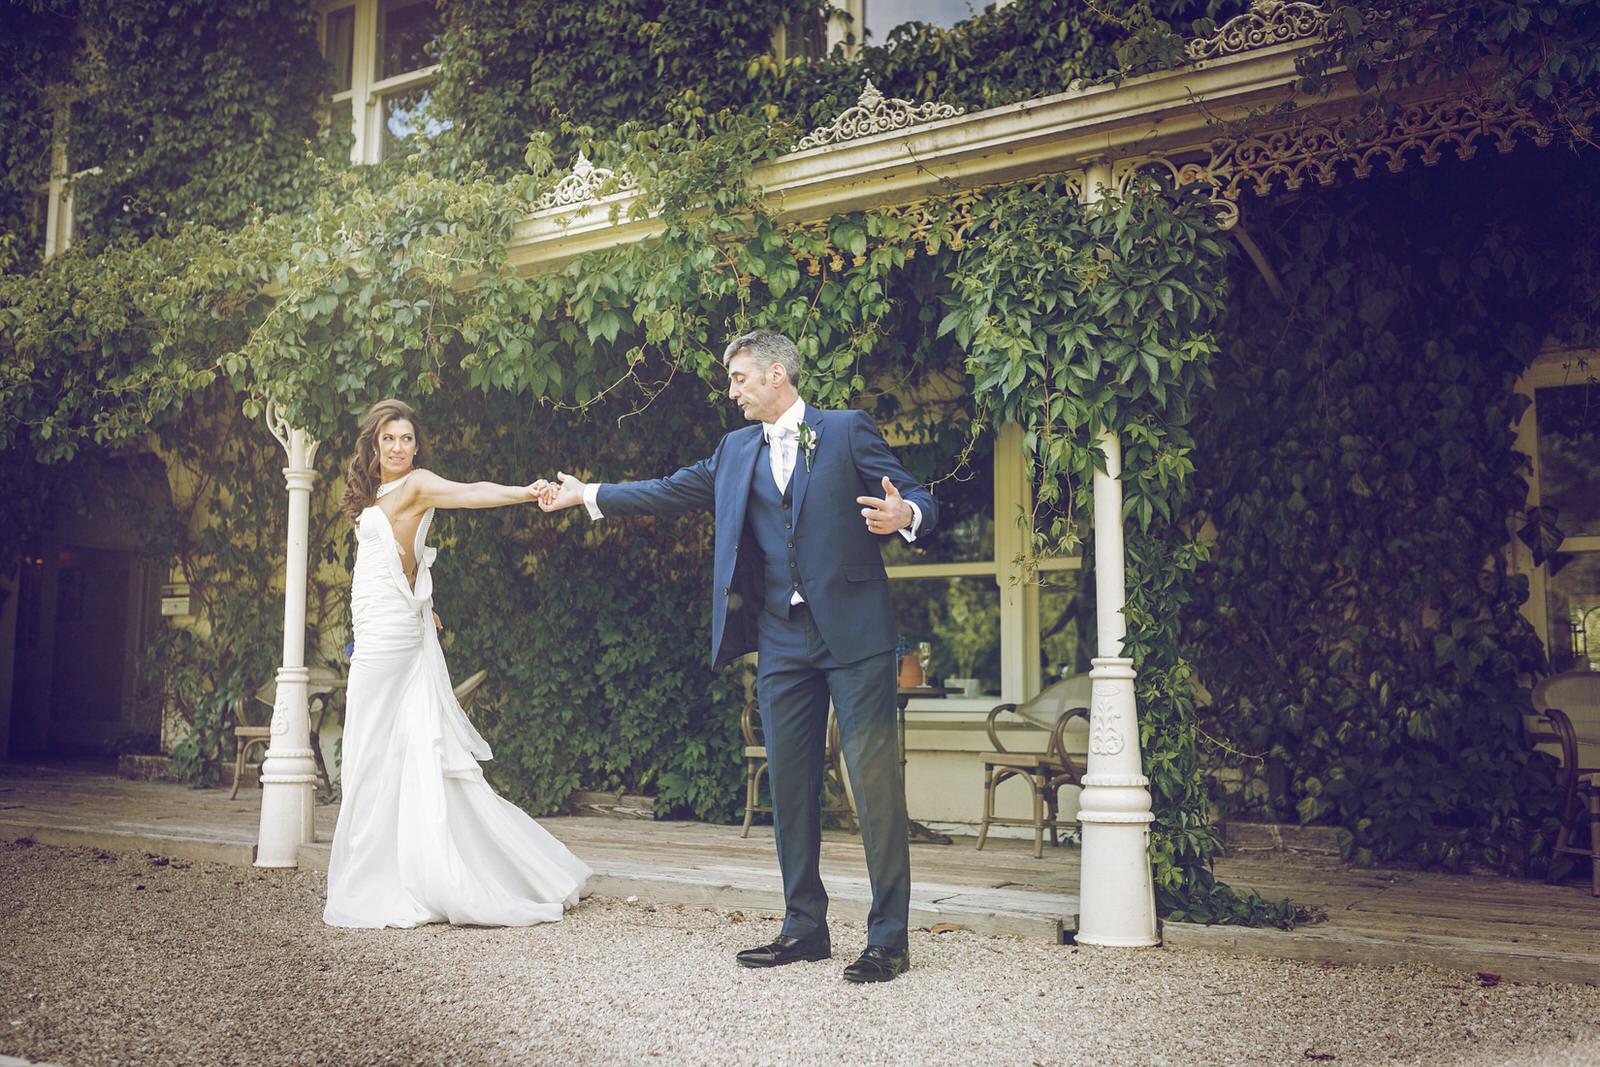 Brooklodge-wicklow-wedding-photographer_114.jpg